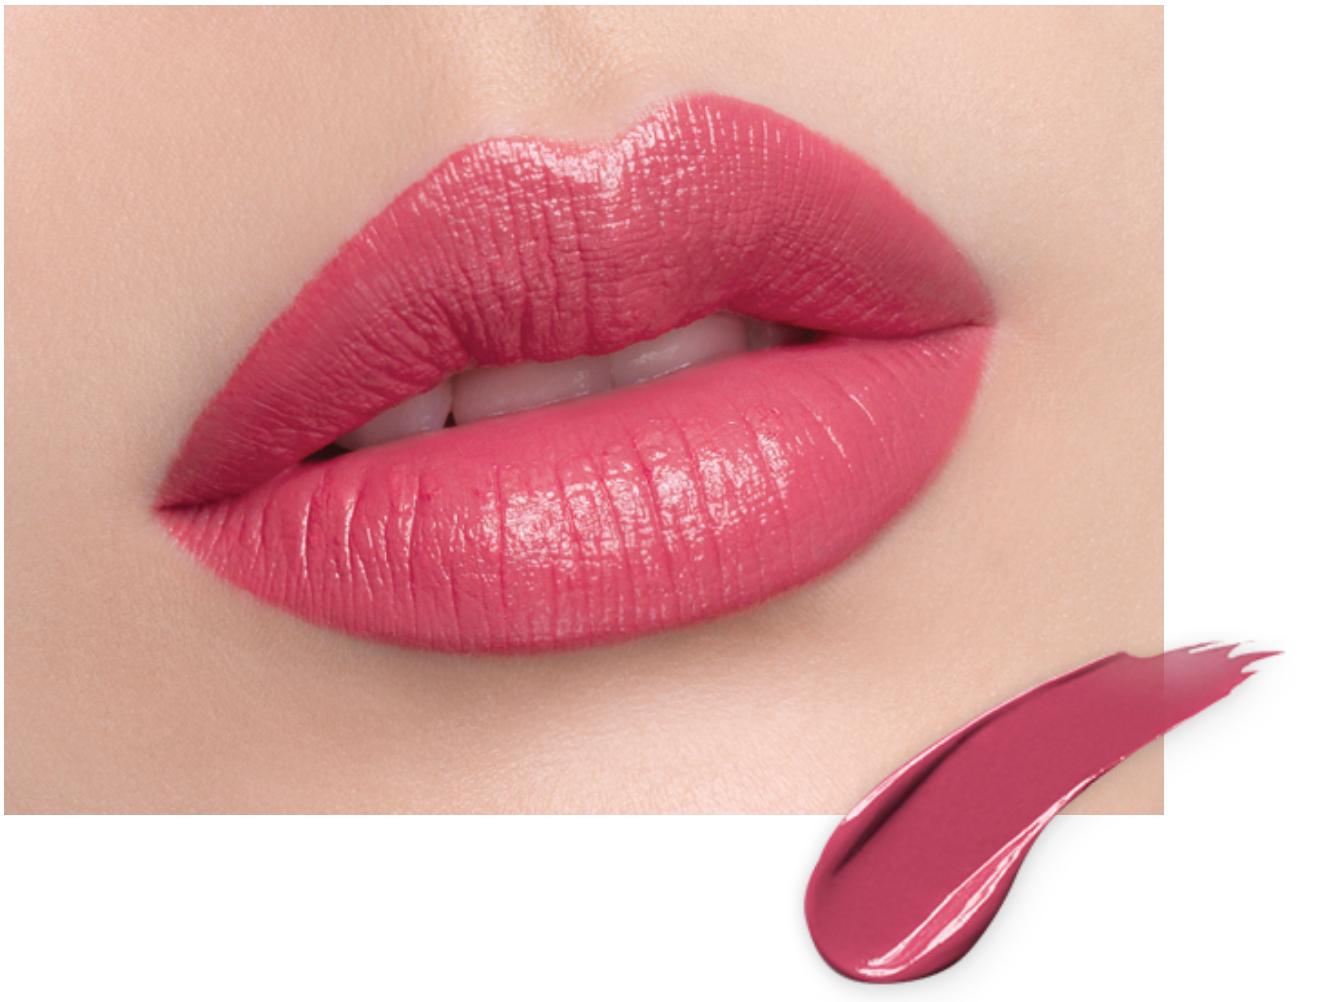 laneige-silk-intense-lipstick-450.png